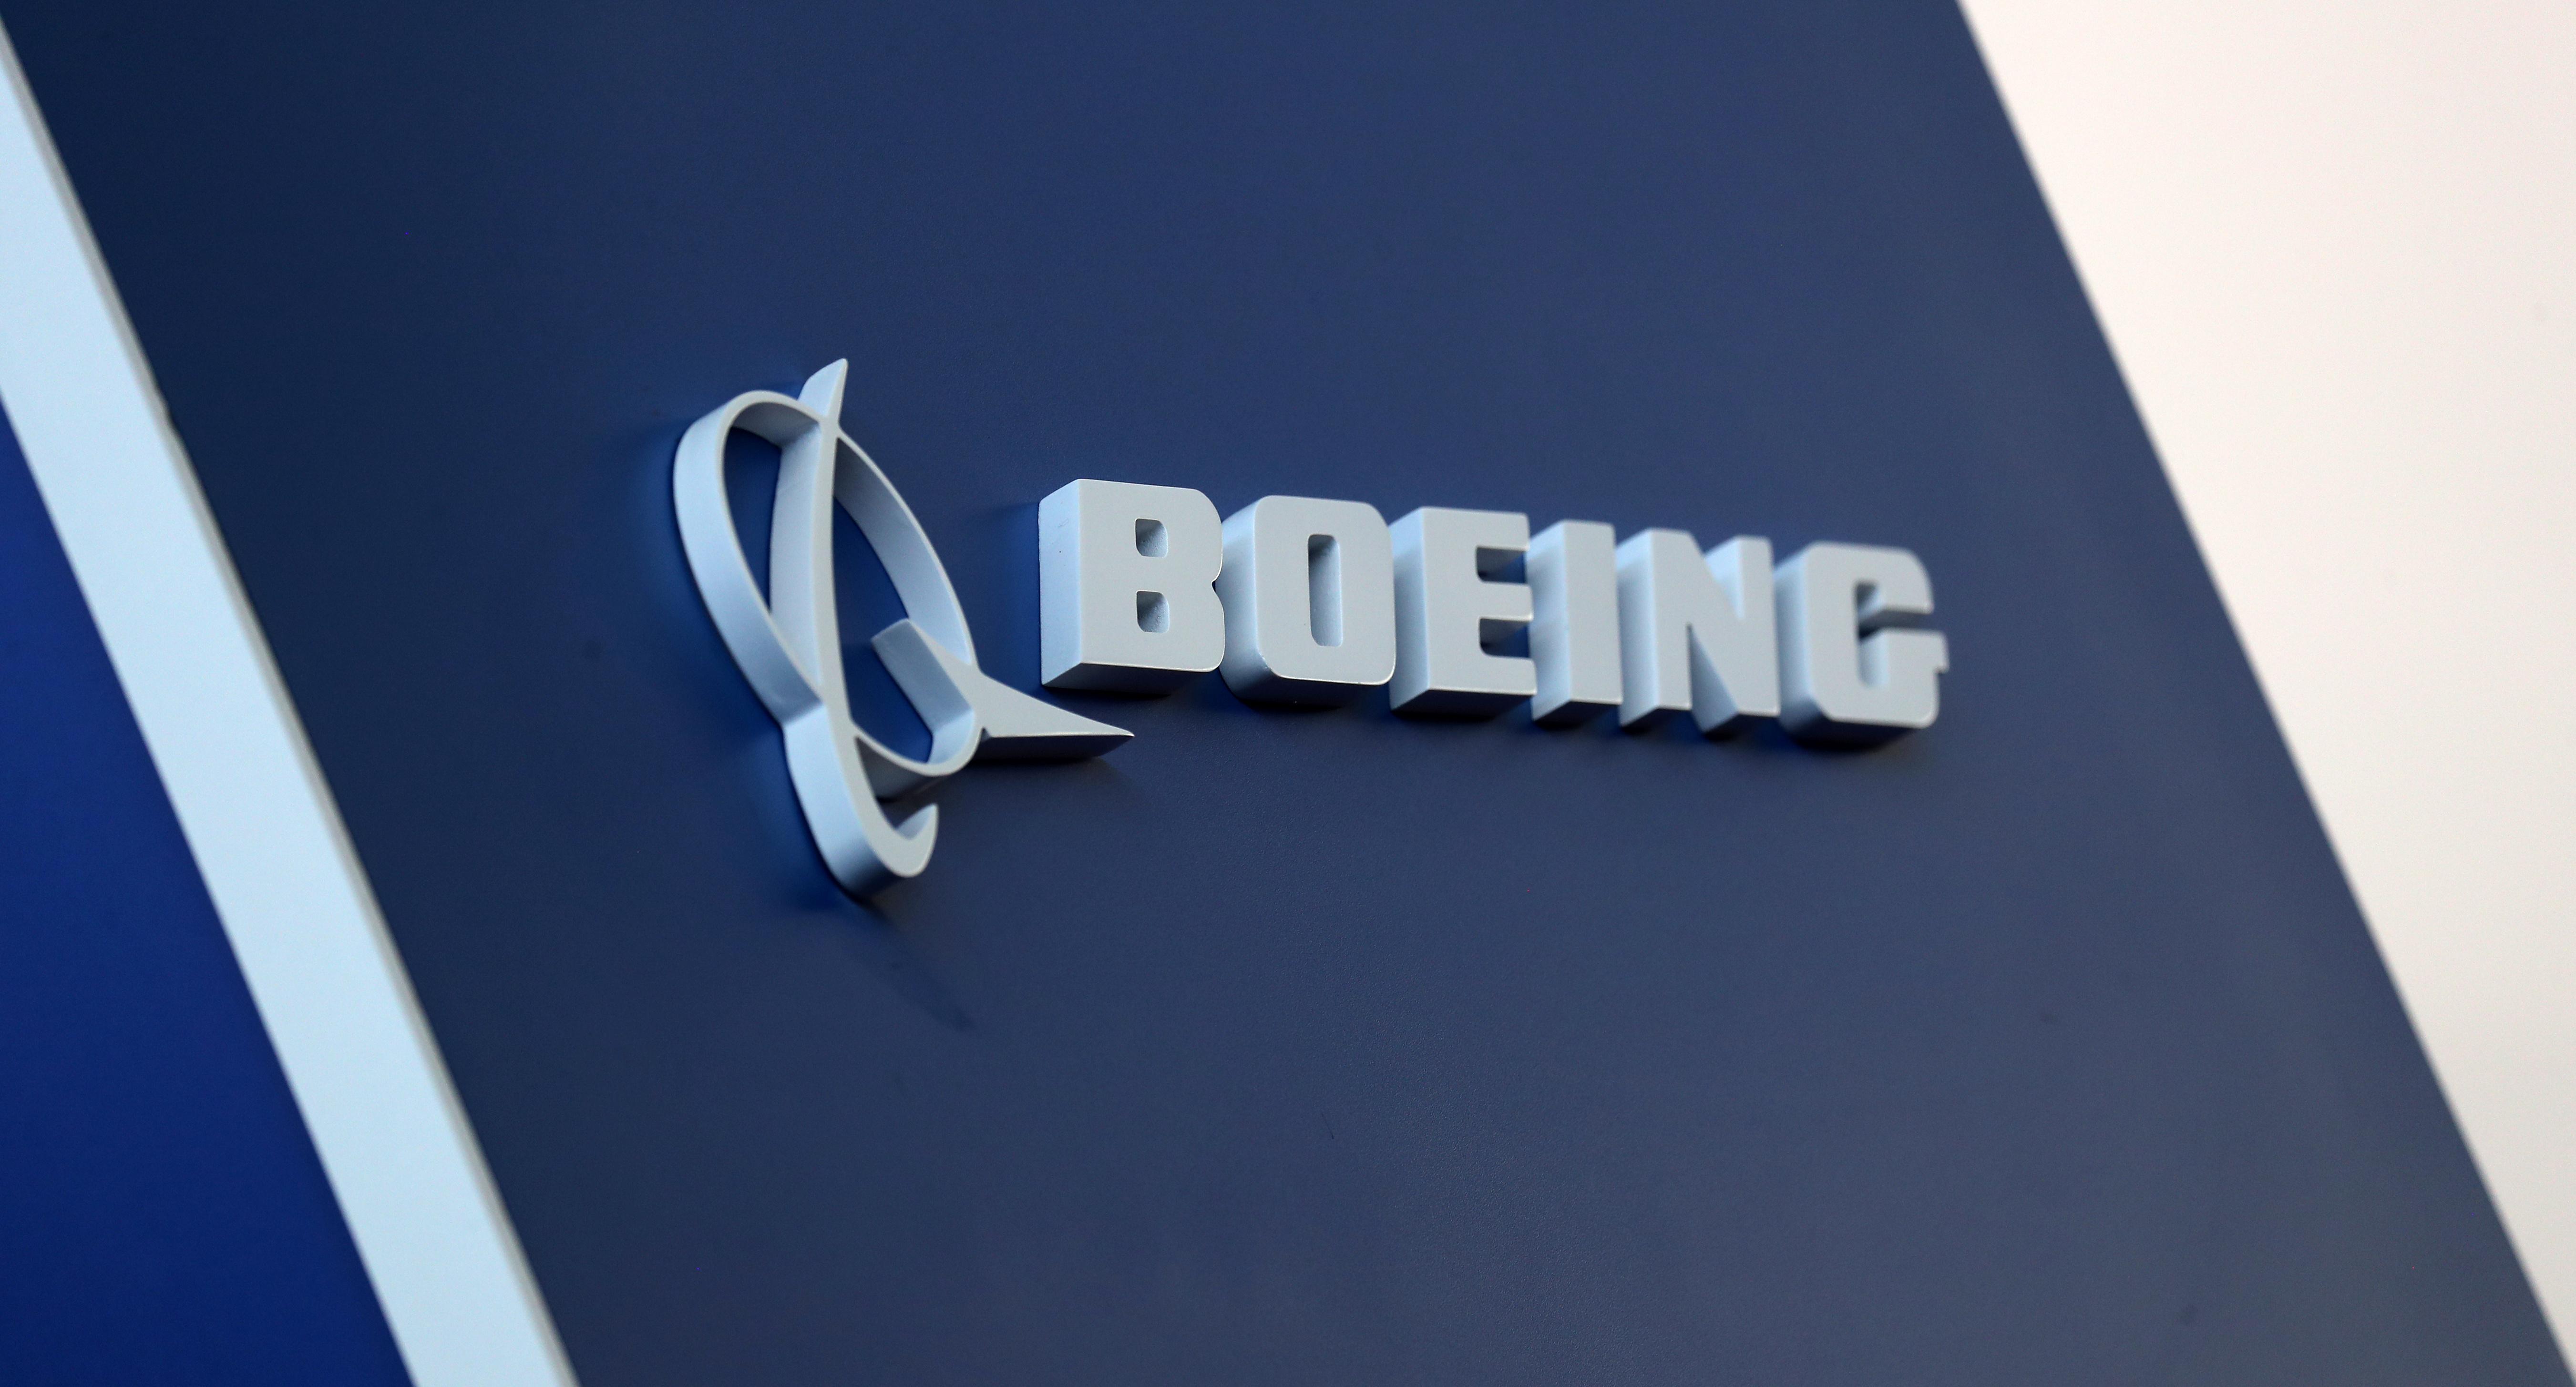 Boeing expresses regret over ex-pilot's 737 MAX messages, faults...